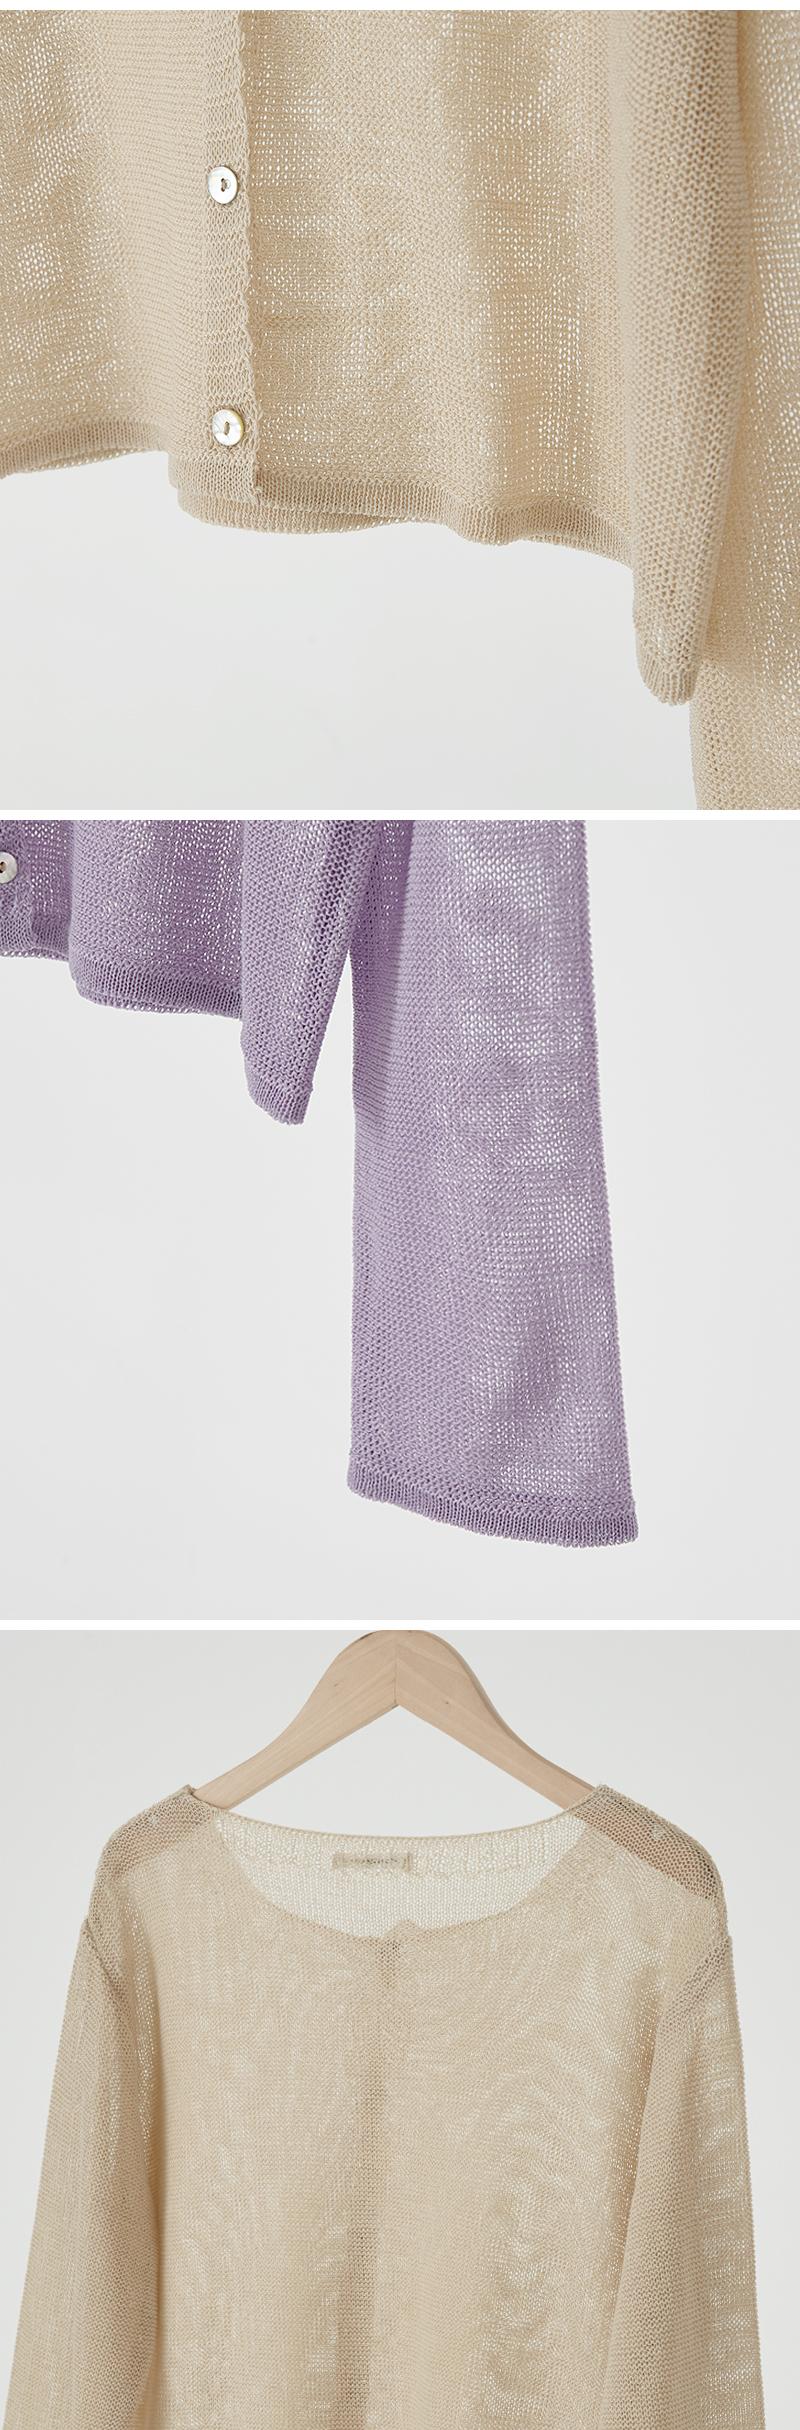 Round See-through Crop Knitwear Cardigan